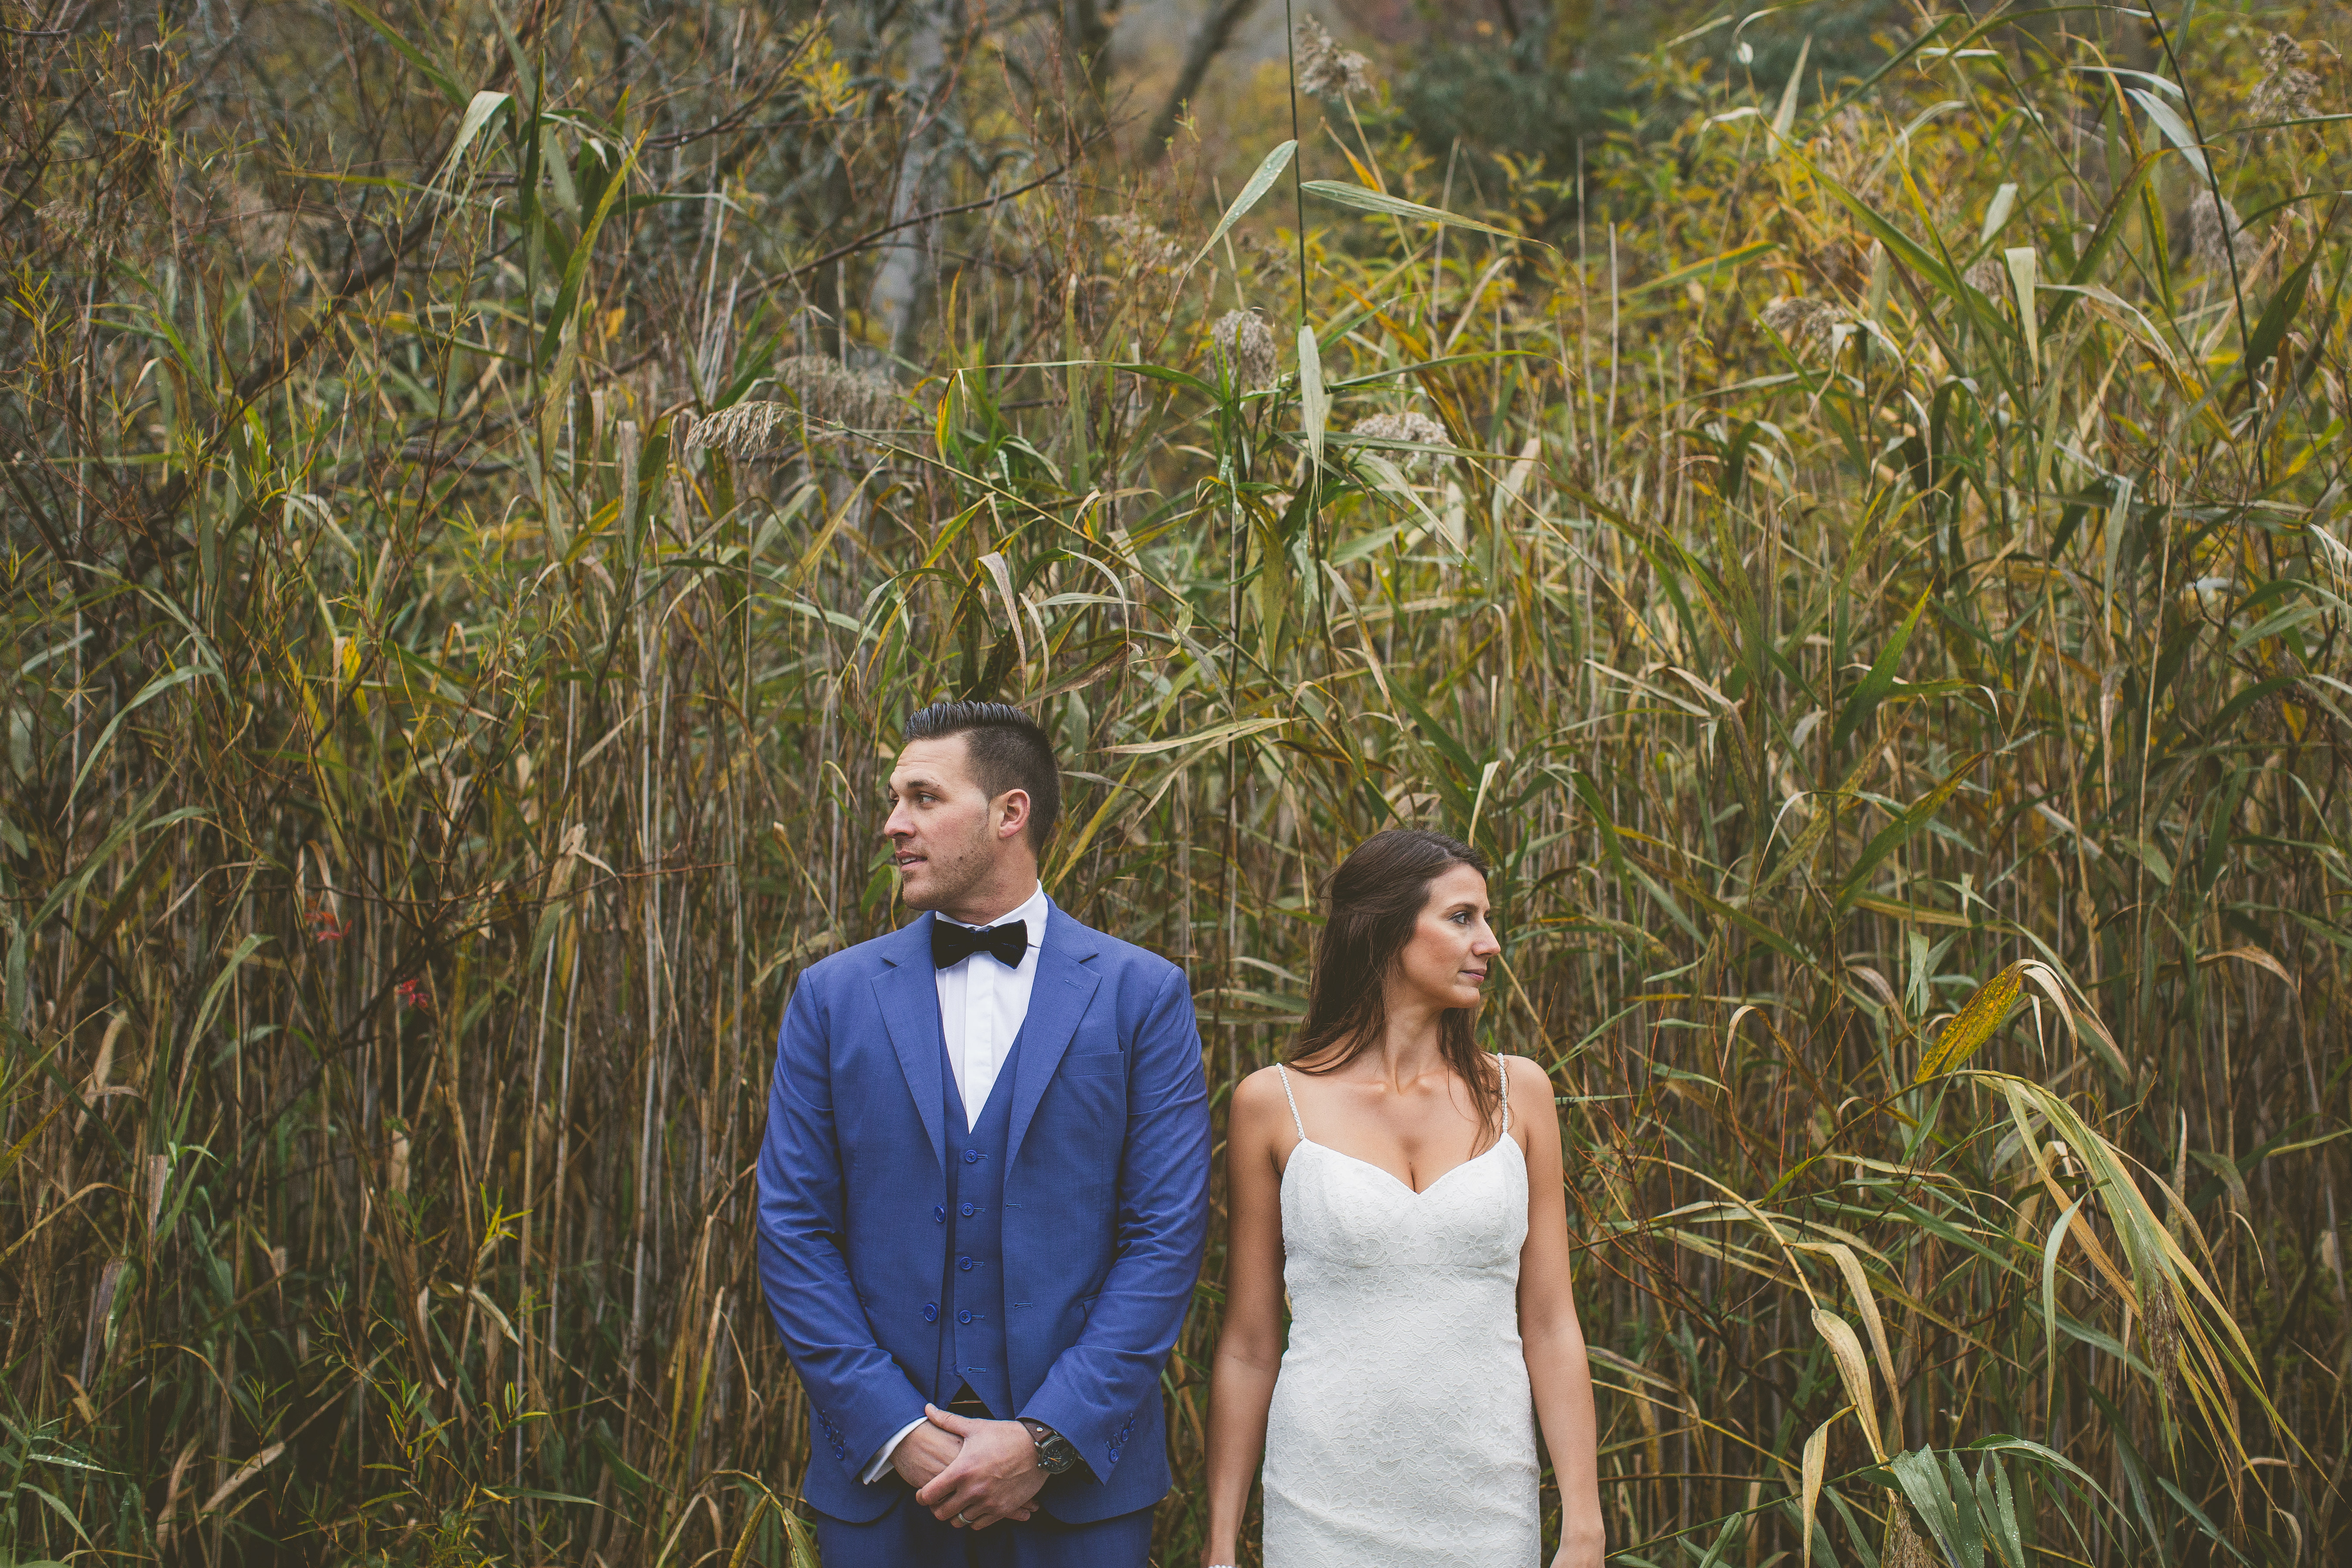 scarborough bluffs wedding photos 78 - Scarborough Bluffs Wedding Photos